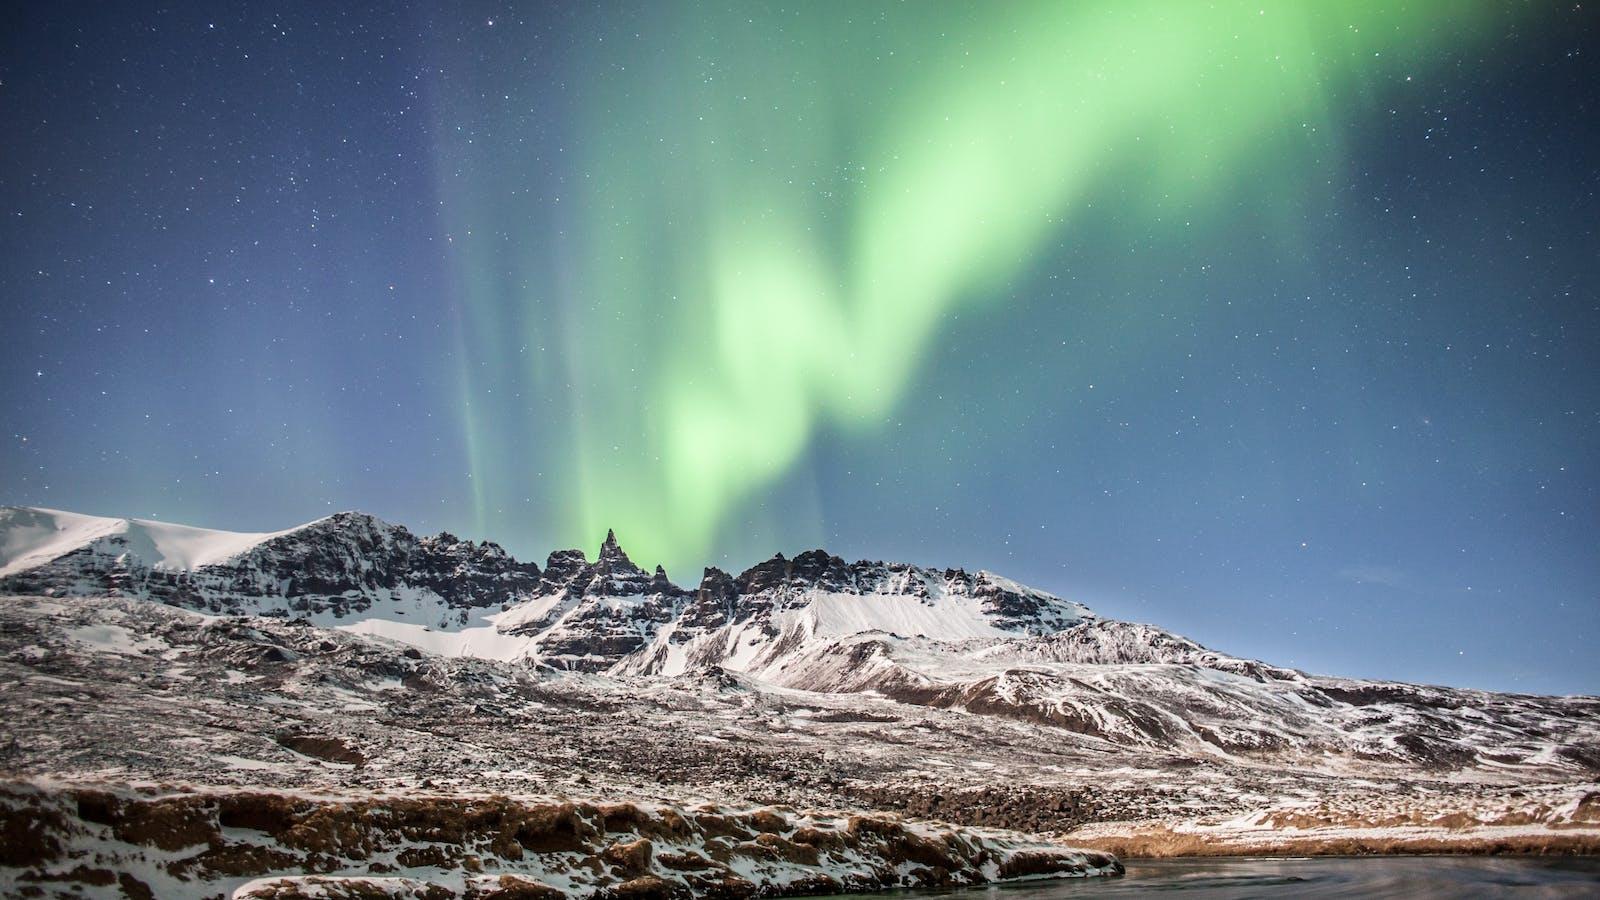 The Northern Lights make an appearance over the Jökulsarlón glacier lagoon.